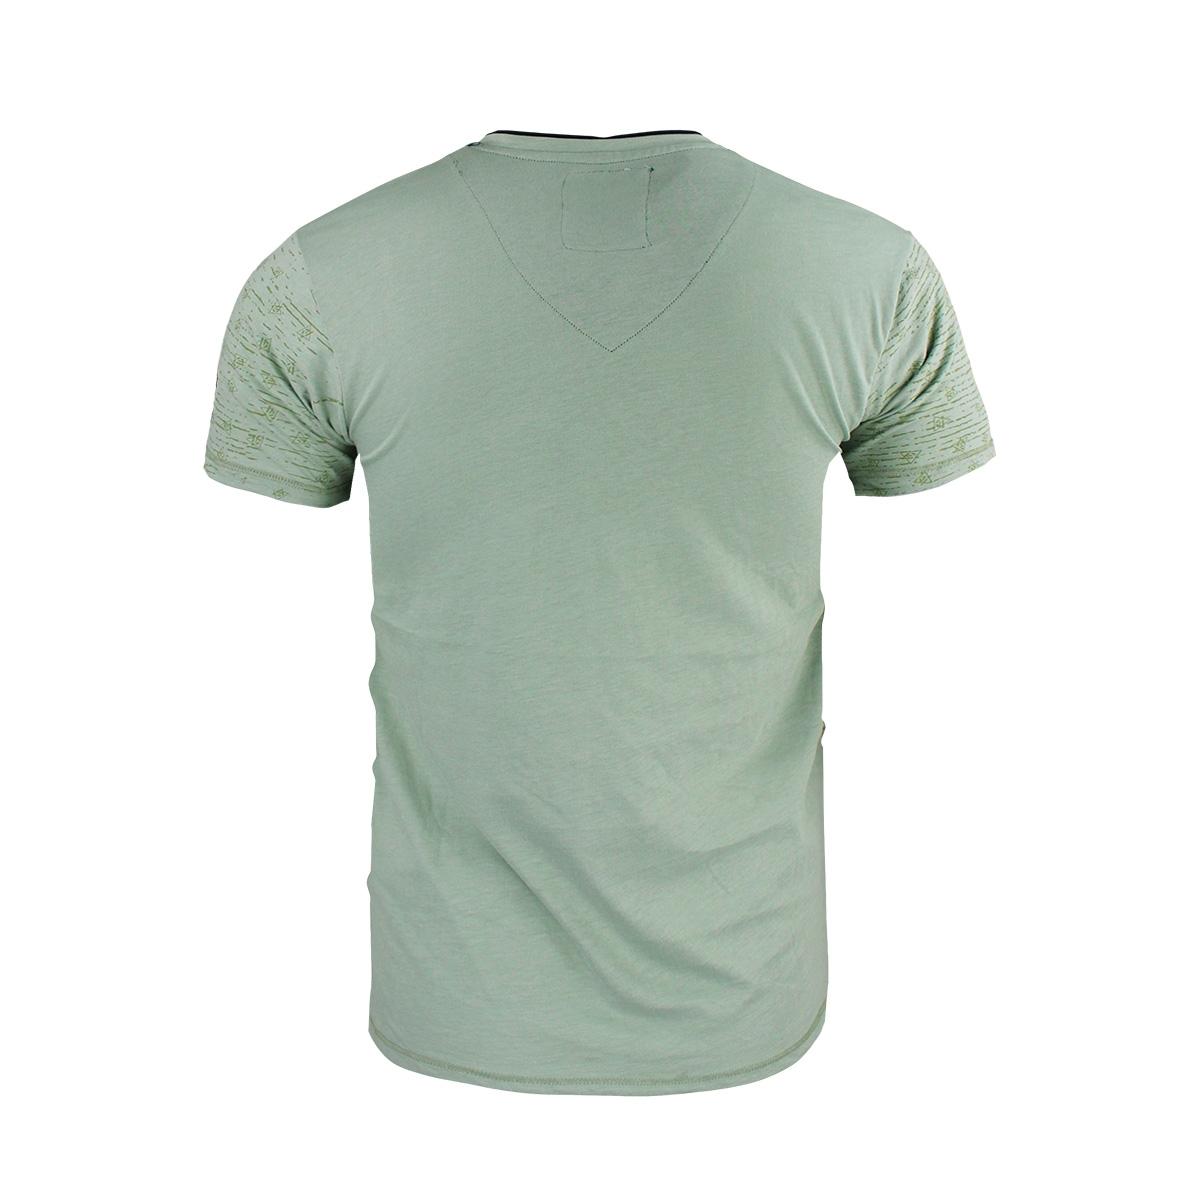 15127 gabbiano t-shirt green